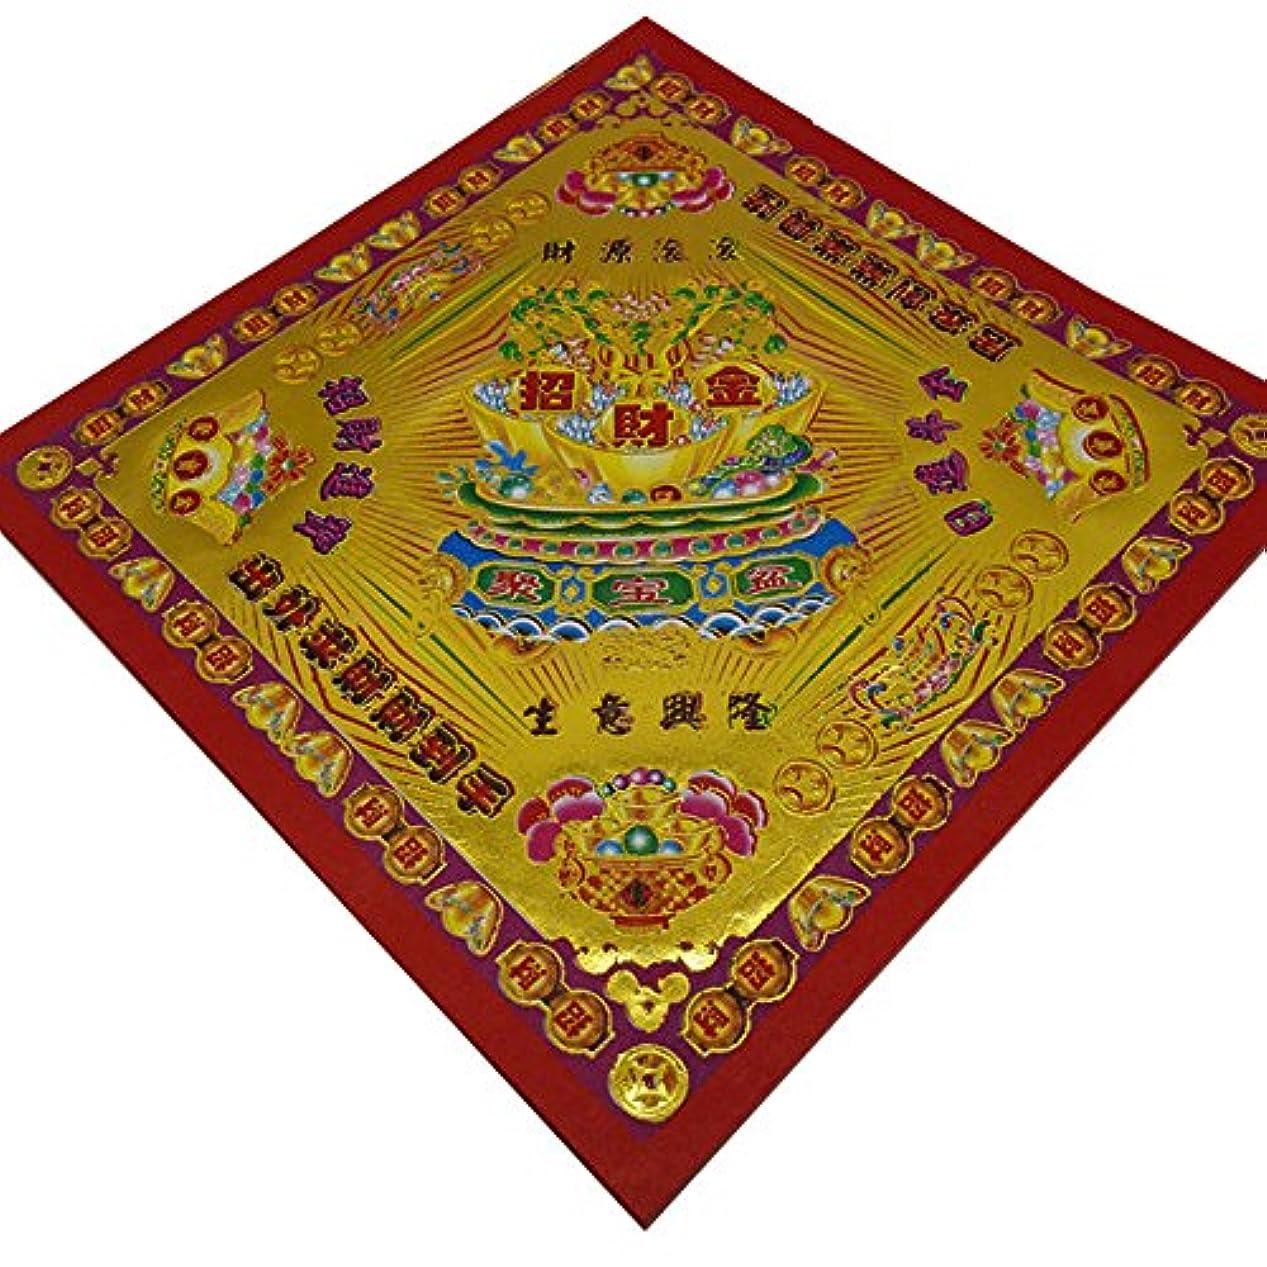 zeestar 40個Chinese Joss Incense用紙/Incense用紙 – For Ancestral Worship – zhaocaijin